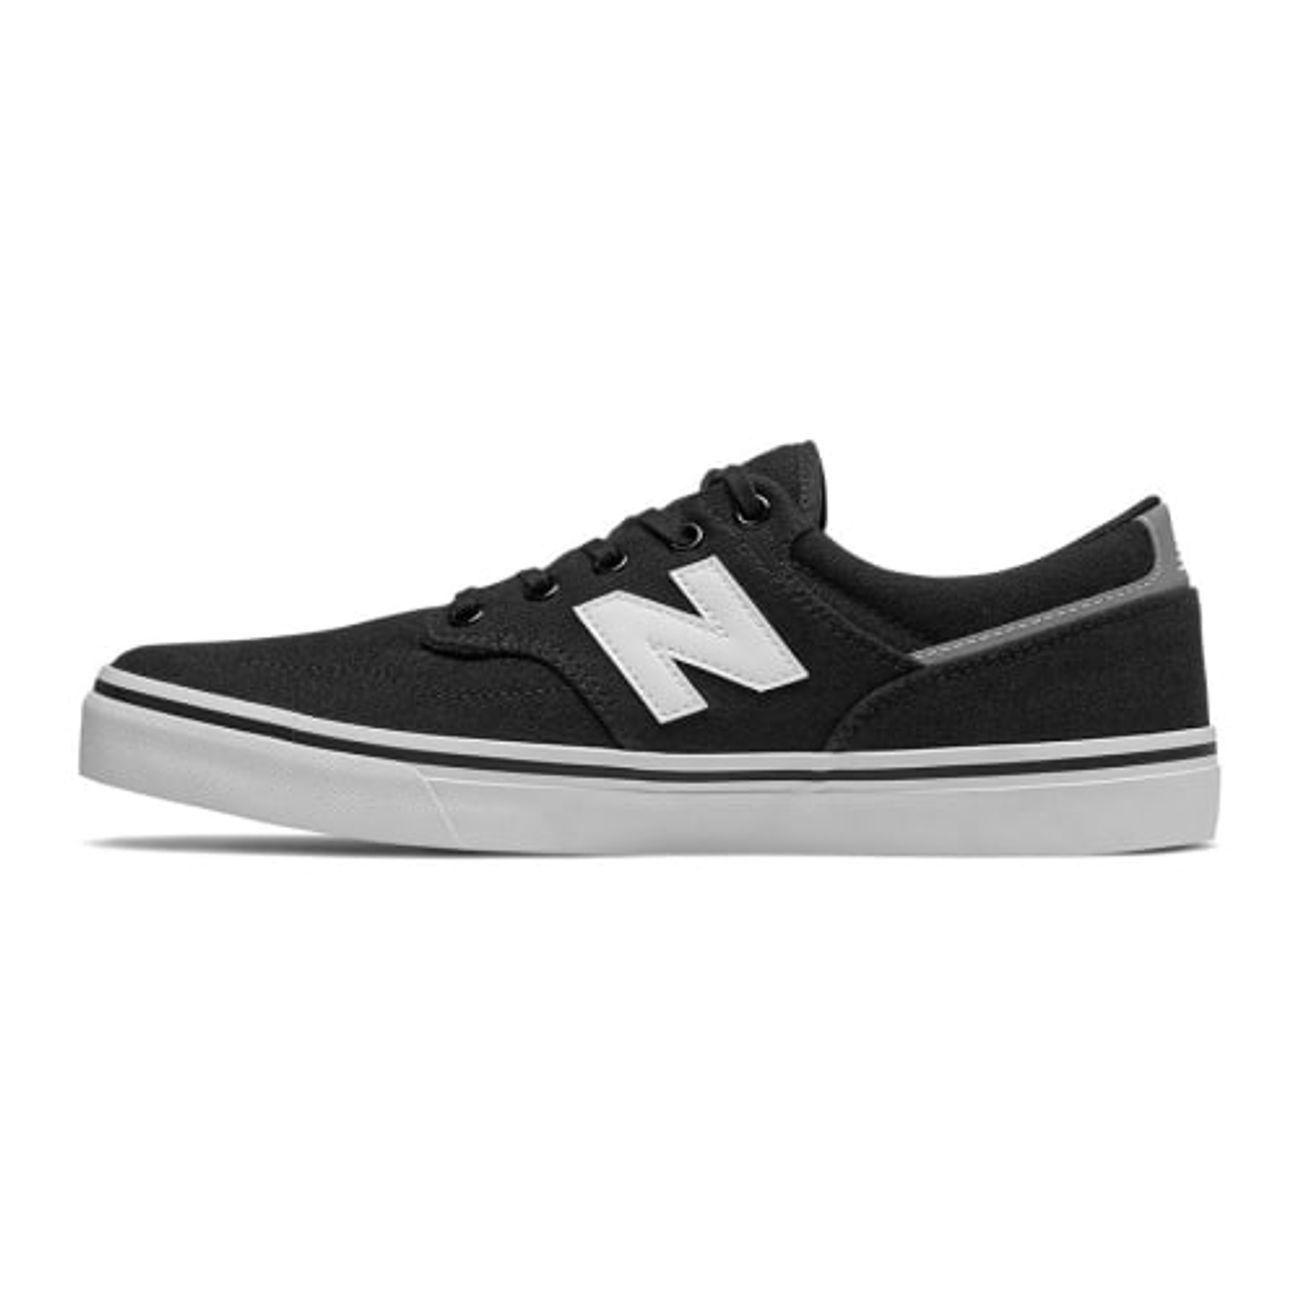 New Style Homme Foncé Gris All Coasts Blanc Am331 Chaussures Balance Skate tdCxBshorQ